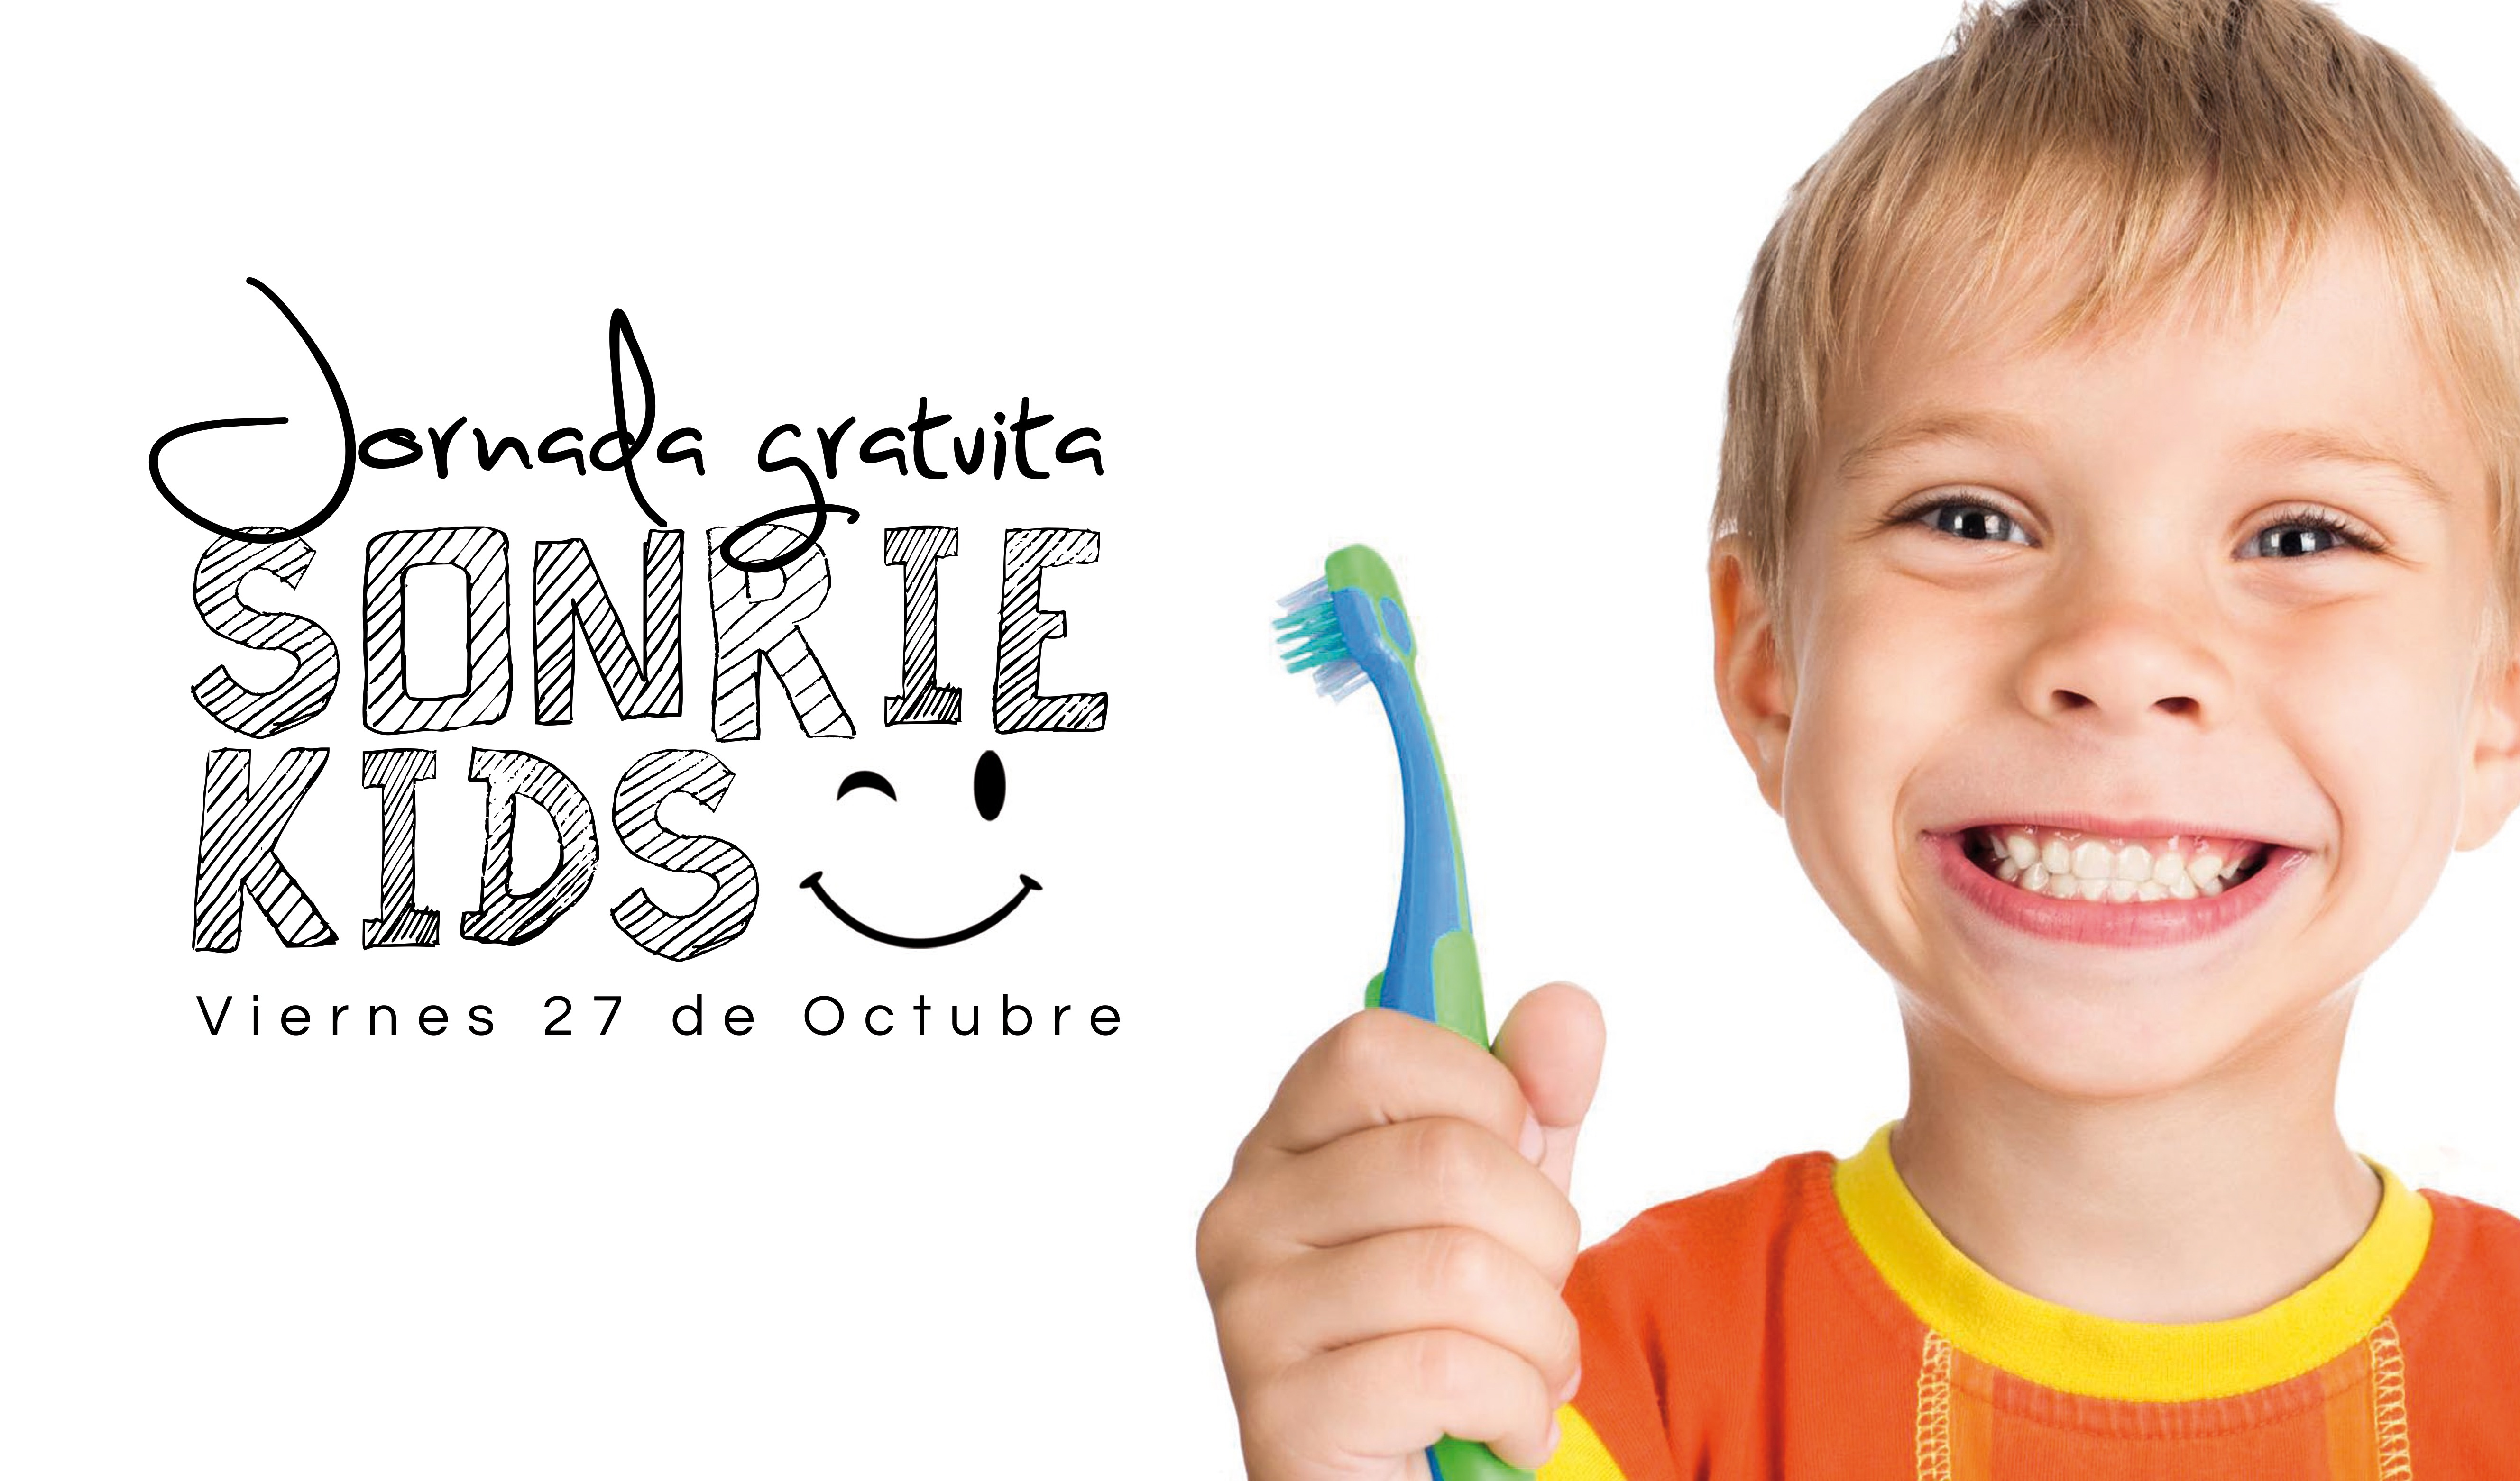 Jornada KIDS este próximo Viernes 27 de Octubre